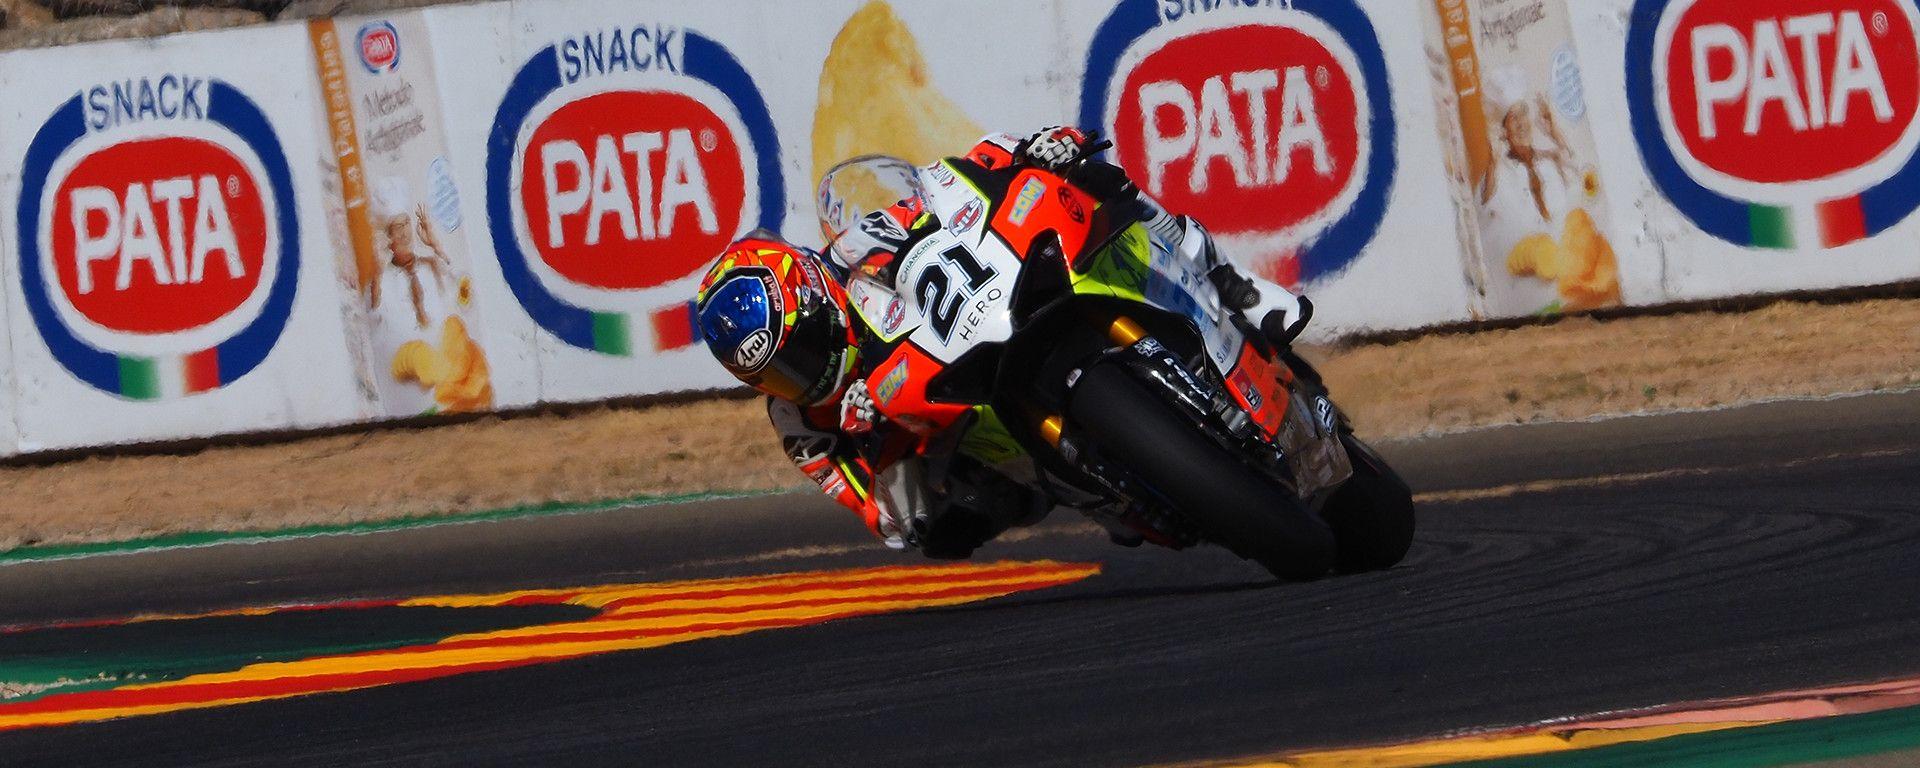 WorldSBK Round Teruel, Alcaniz: Michael Ruben Rinaldi (Ducati)